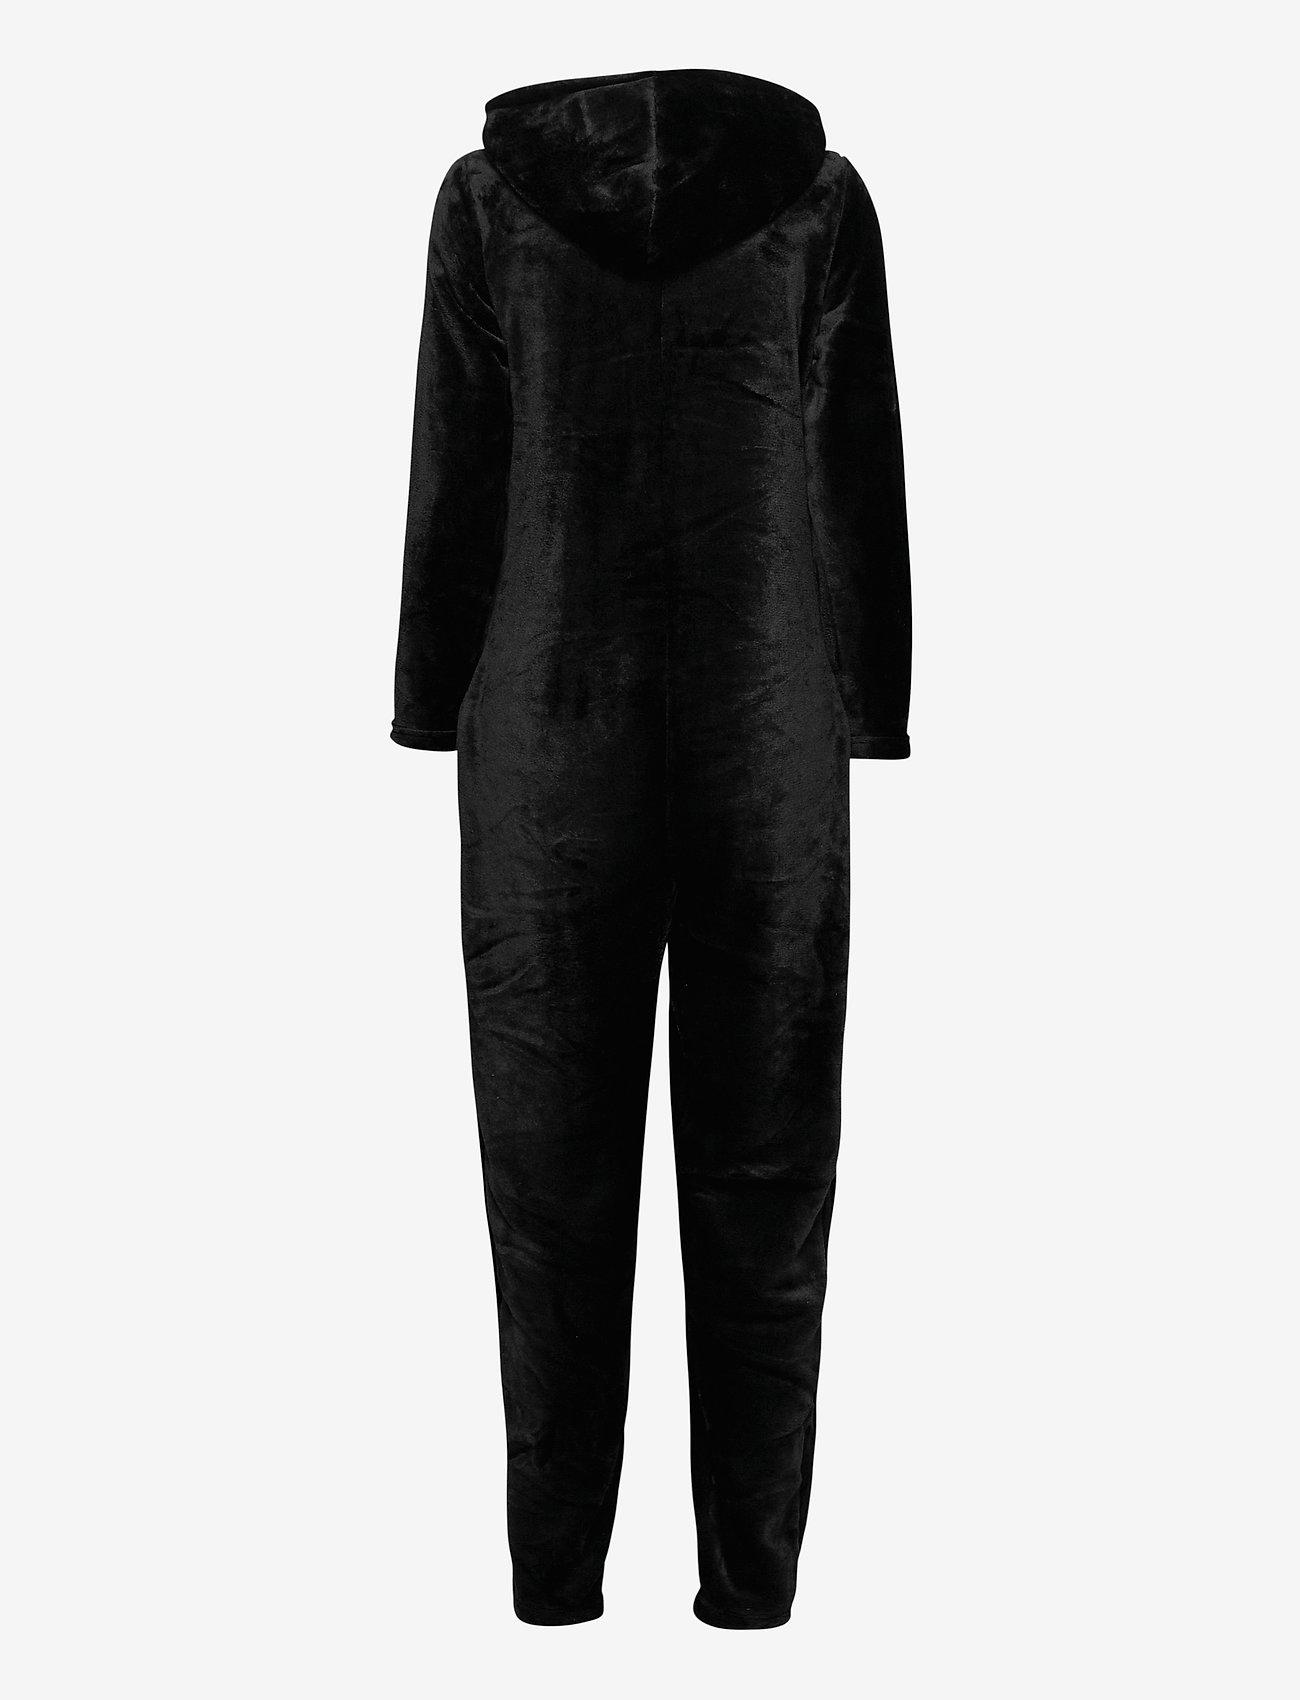 Decoy - DECOY onepiece w/hood, zipper - pyjama''s - svart - 1